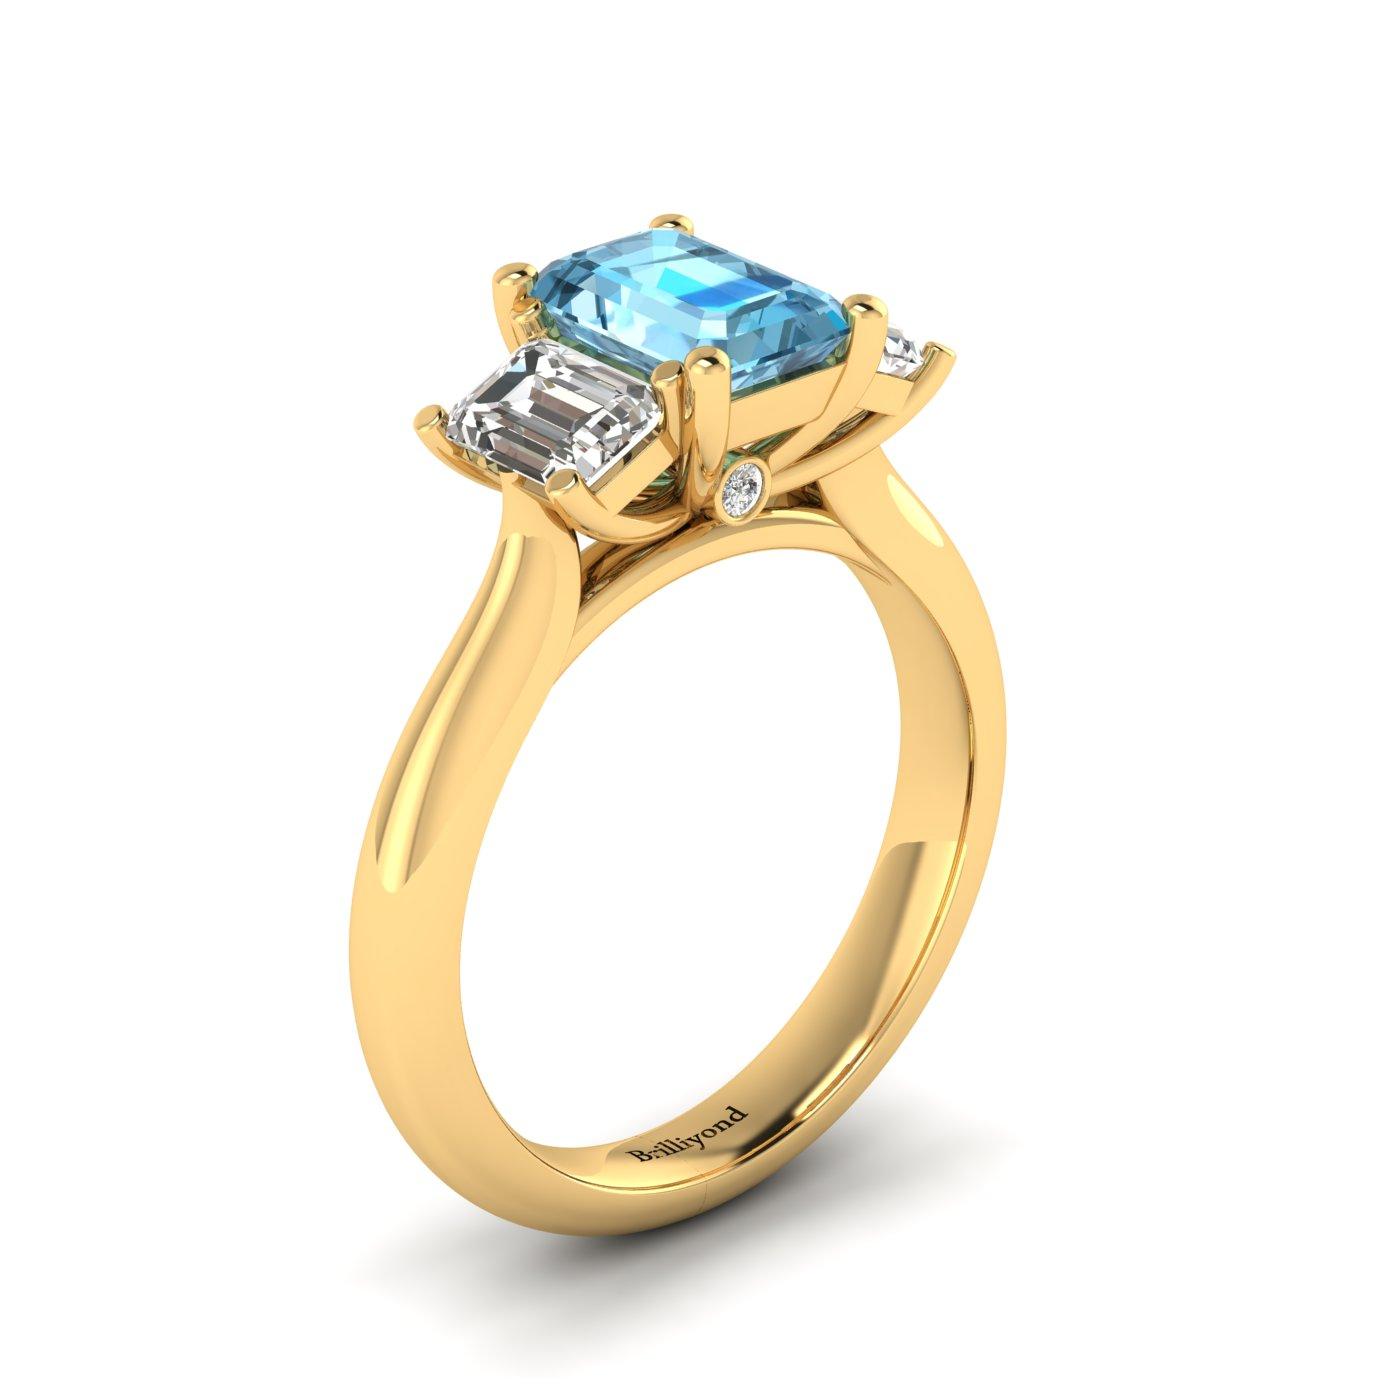 Aquamarine Yellow Gold Emerald Cut Engagement Ring Blanche_image1